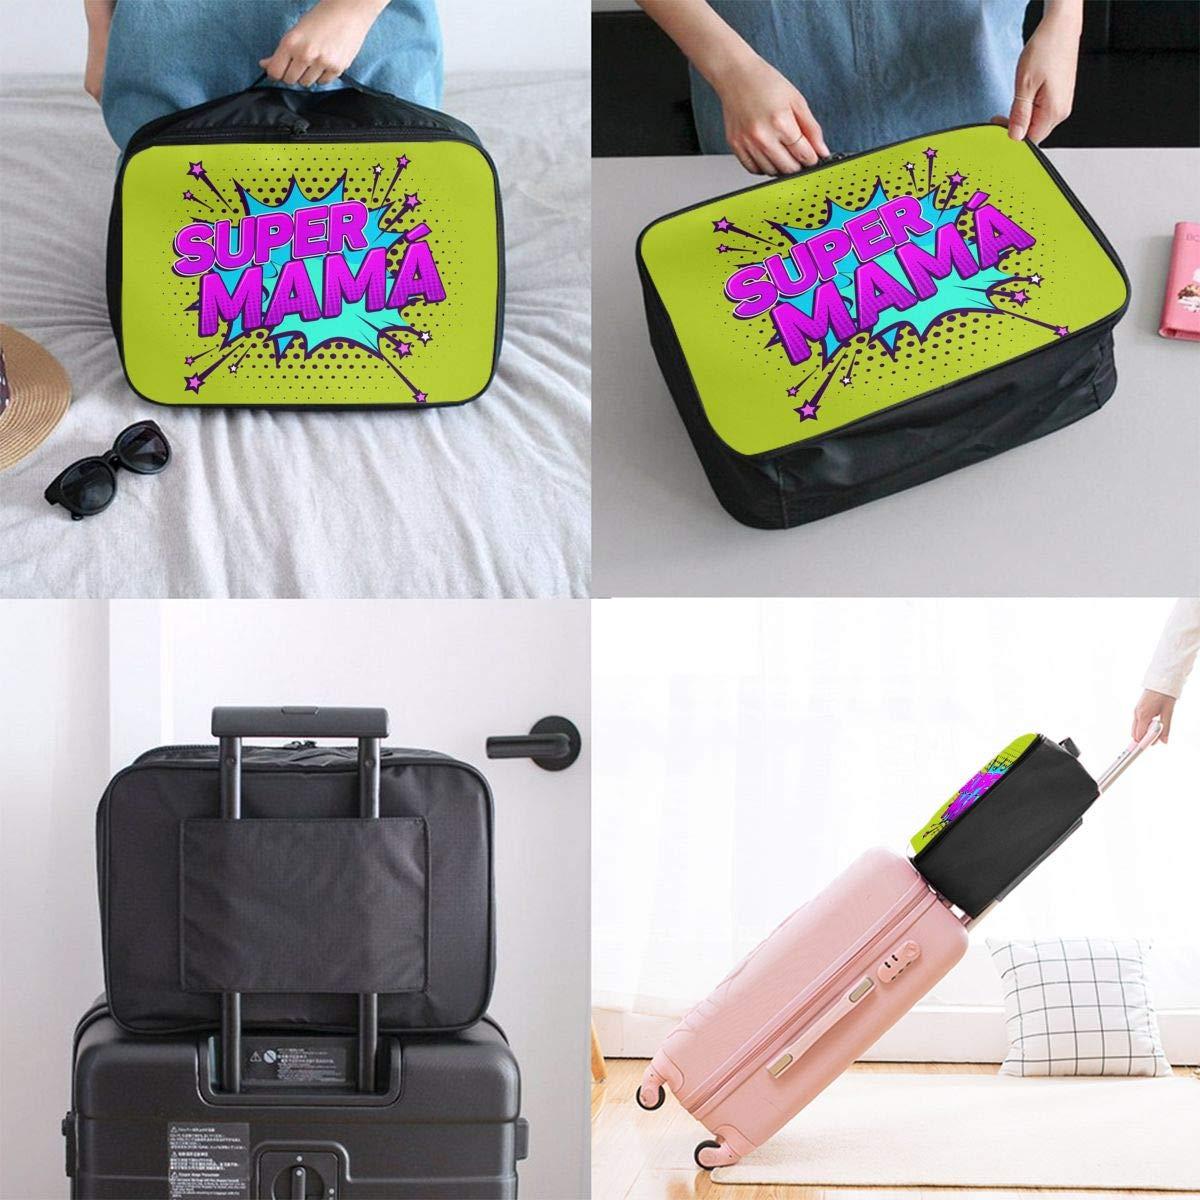 Travel Duffel Bag Waterproof Lightweight Large Capacity Travel Bag Super Mama Portable Weekender Bag For Travel Camping Sport White